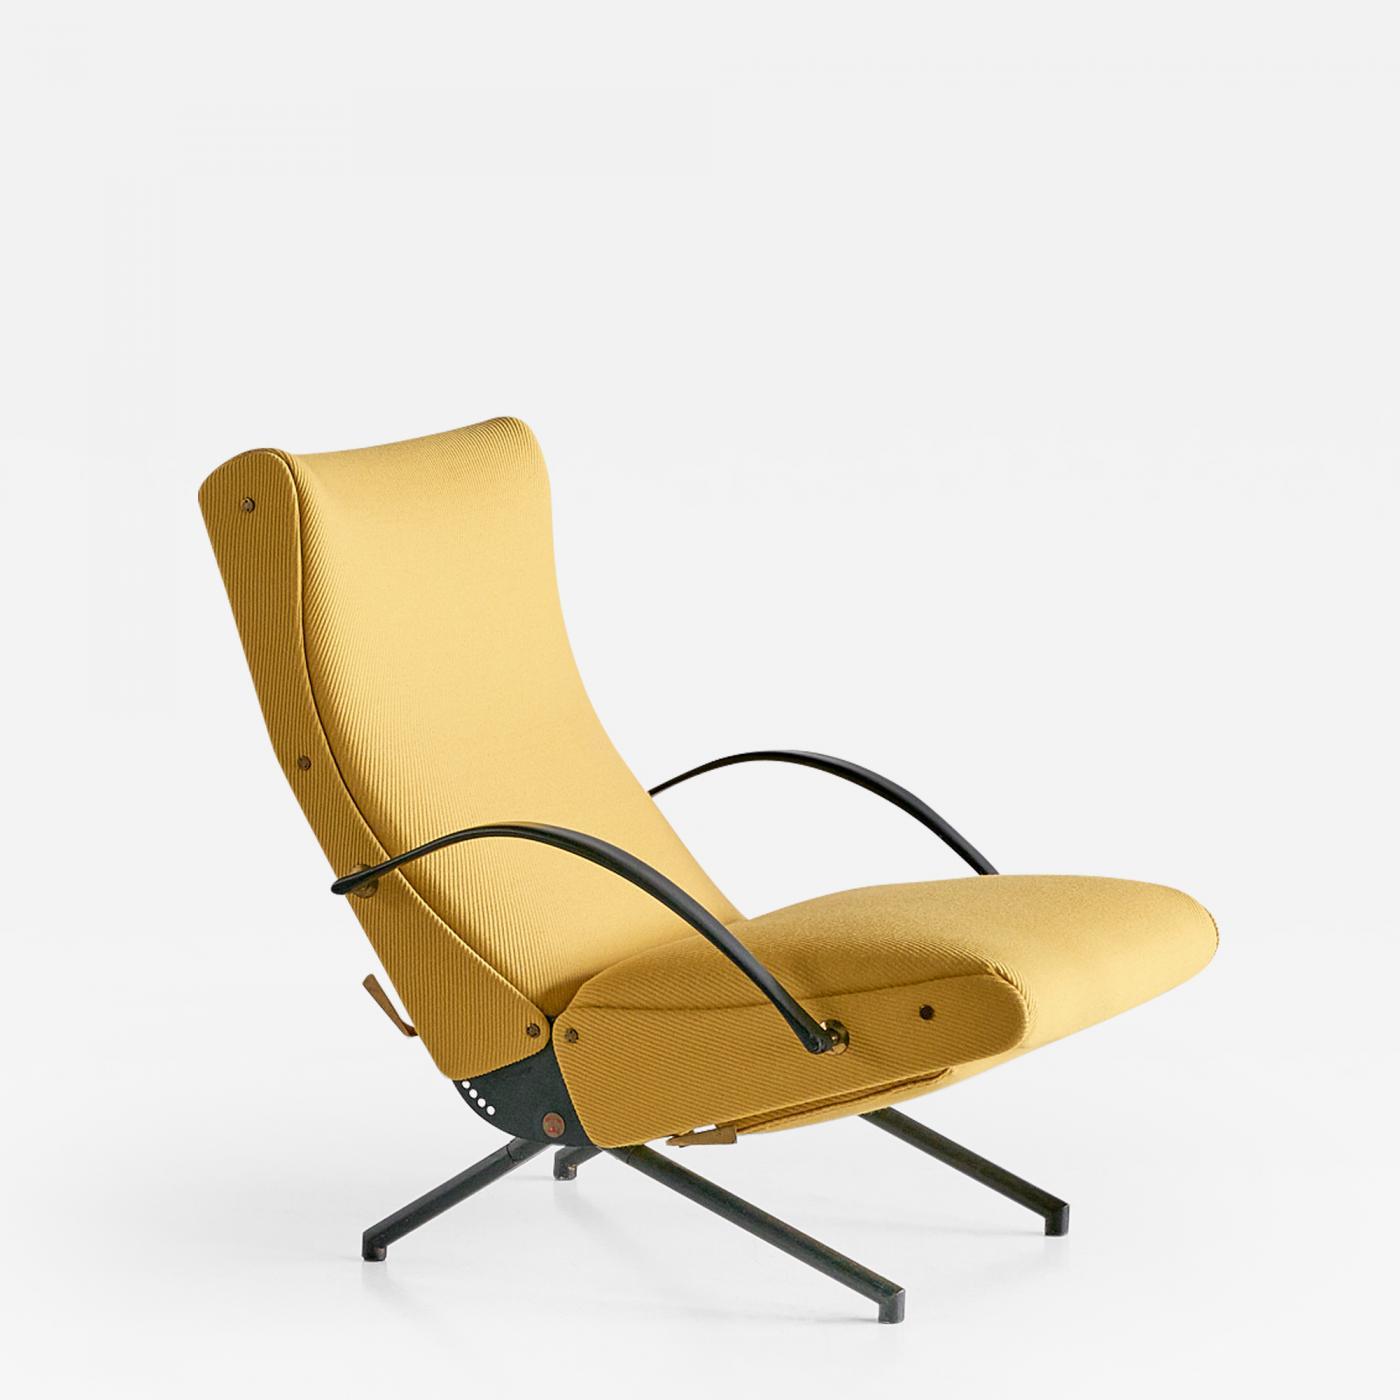 Osvaldo Borsani P40 Lounge Chair, First Edition for Tecno